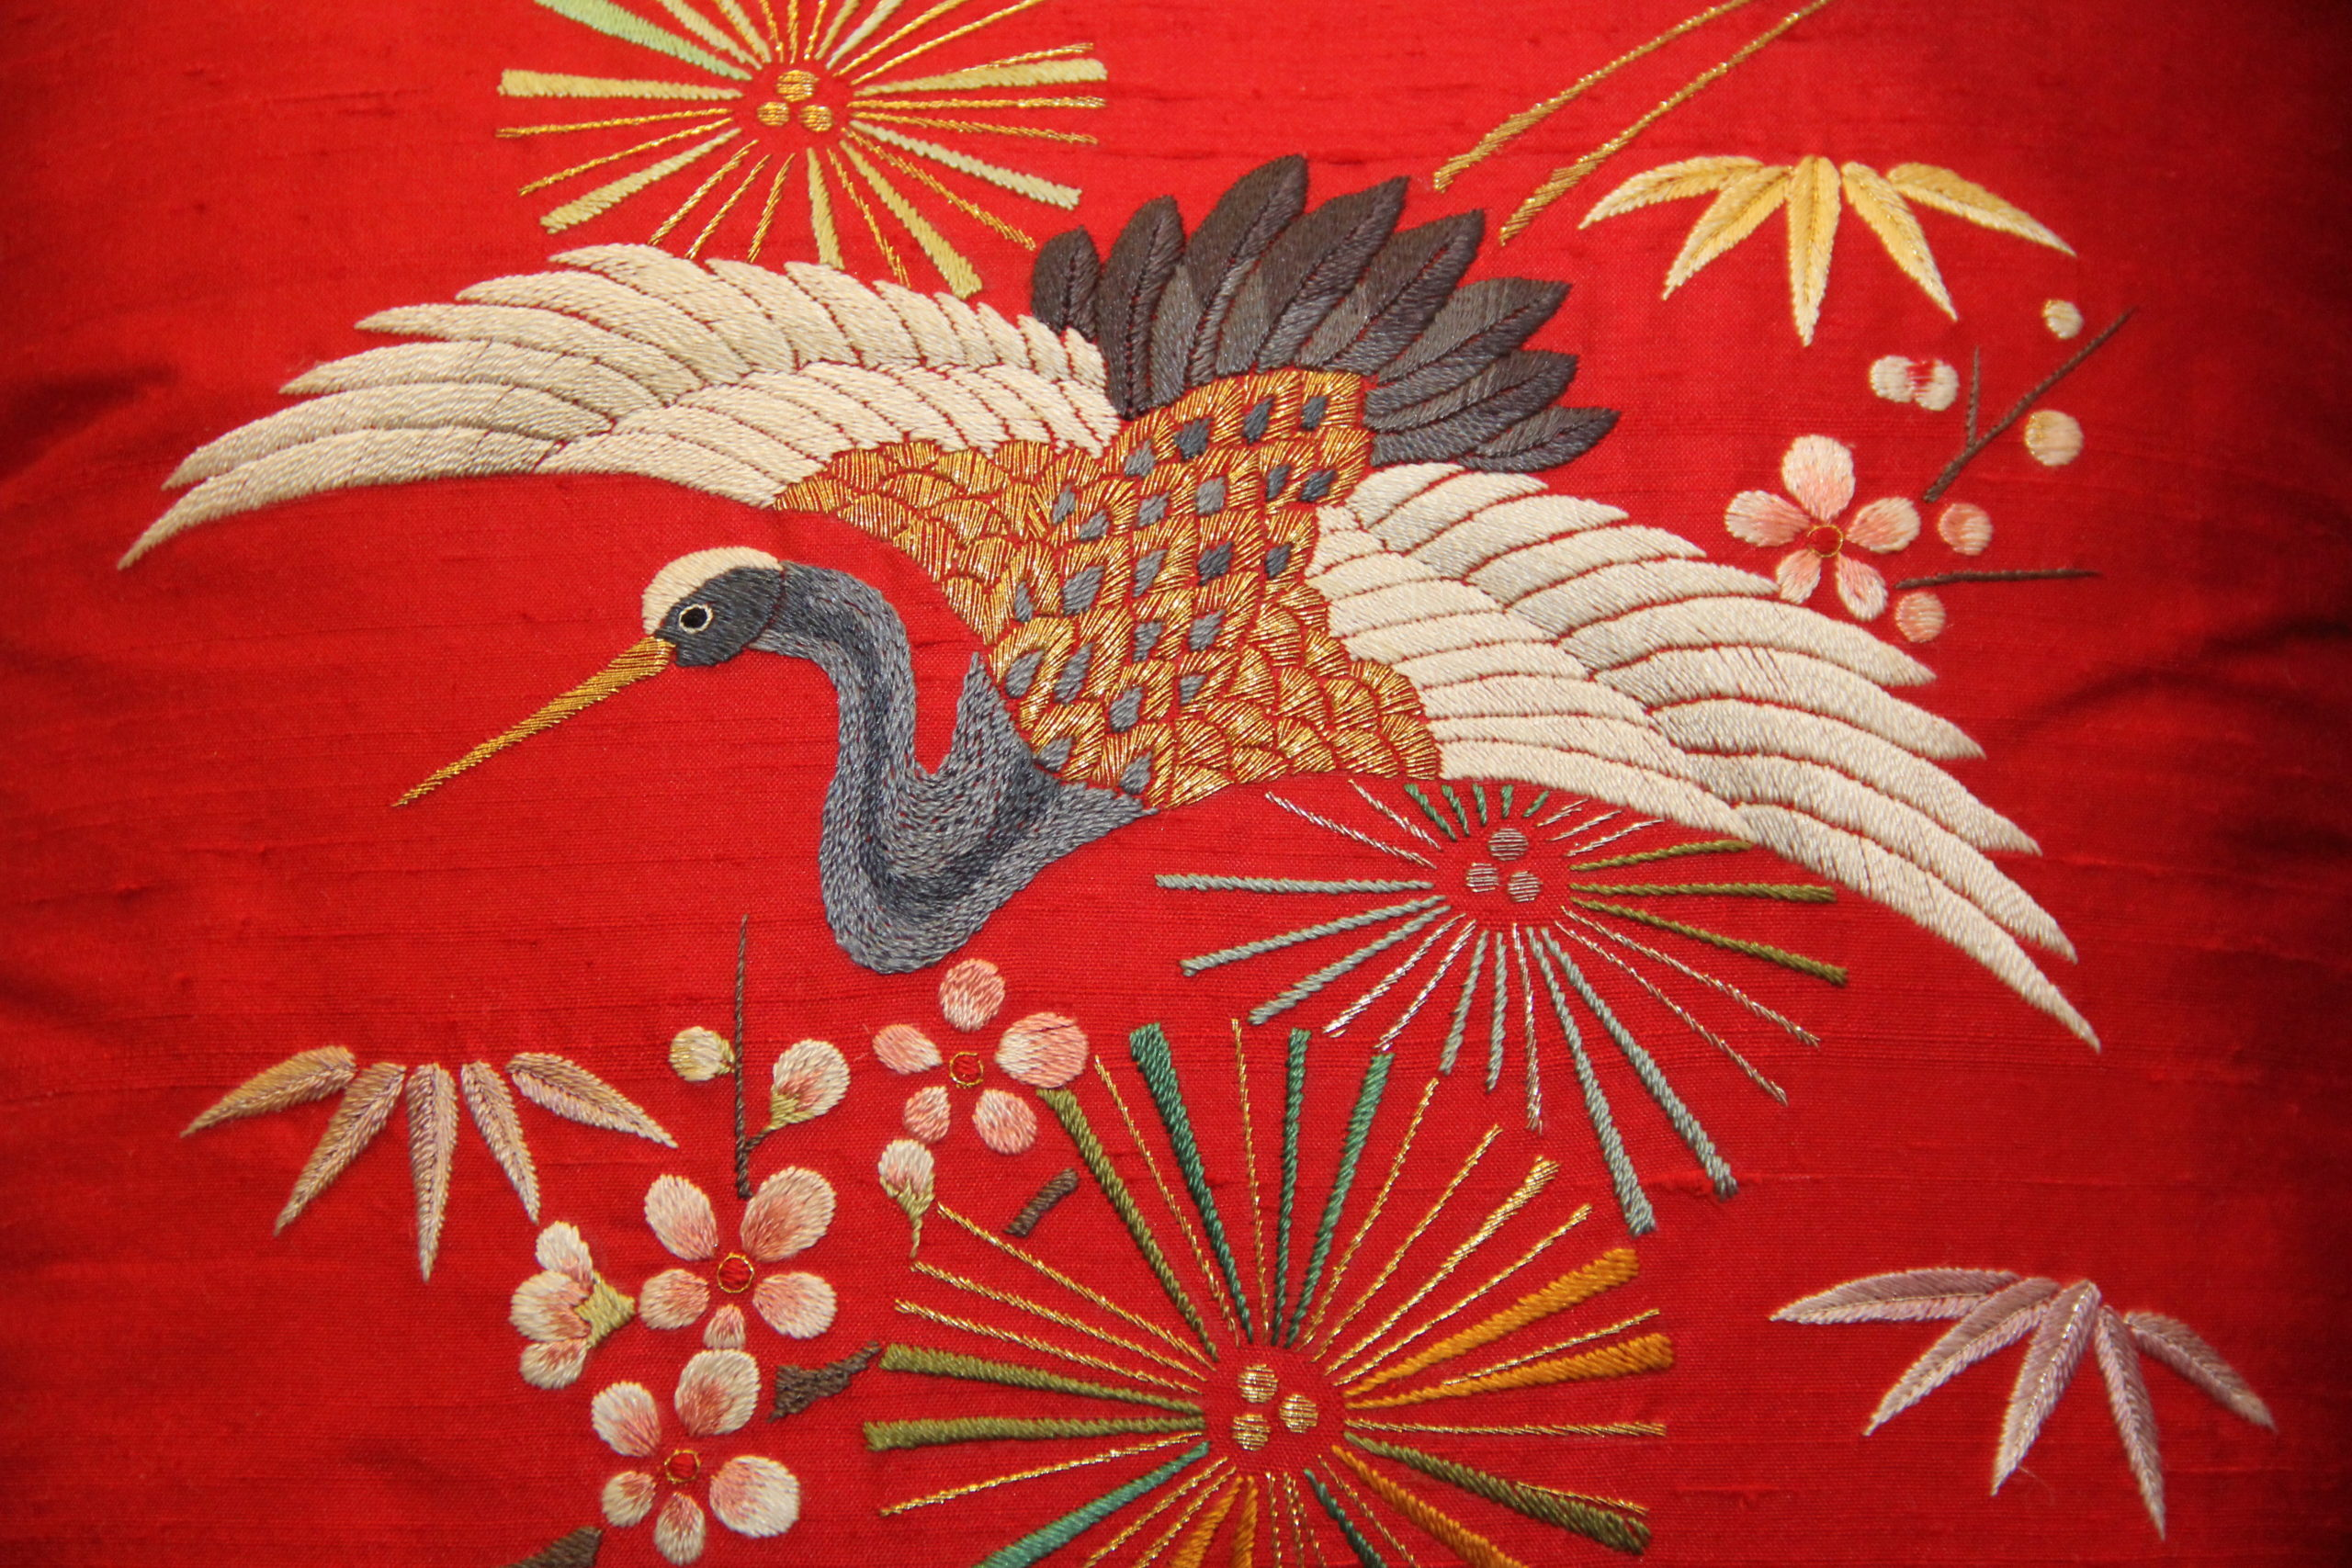 Kaga Embroidery at the Ishikawa Prefectural Museum of Traditional Arts & Crafts, Kanazawa, Japan. Image: City of Kanazawa